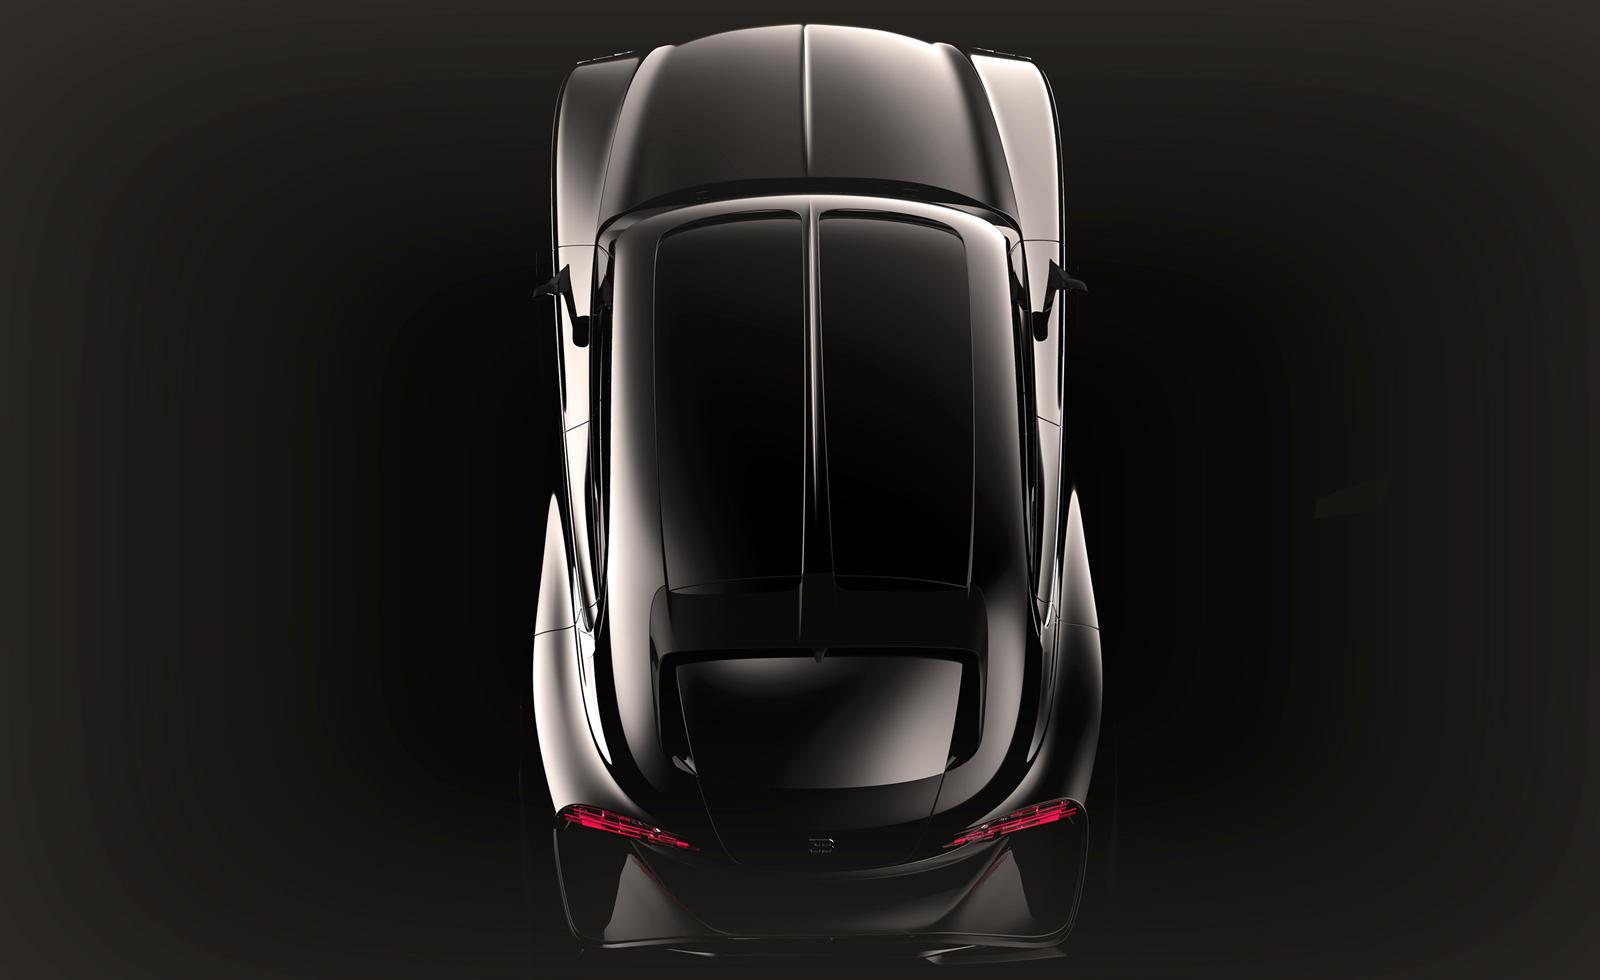 bugatti-5.jpg